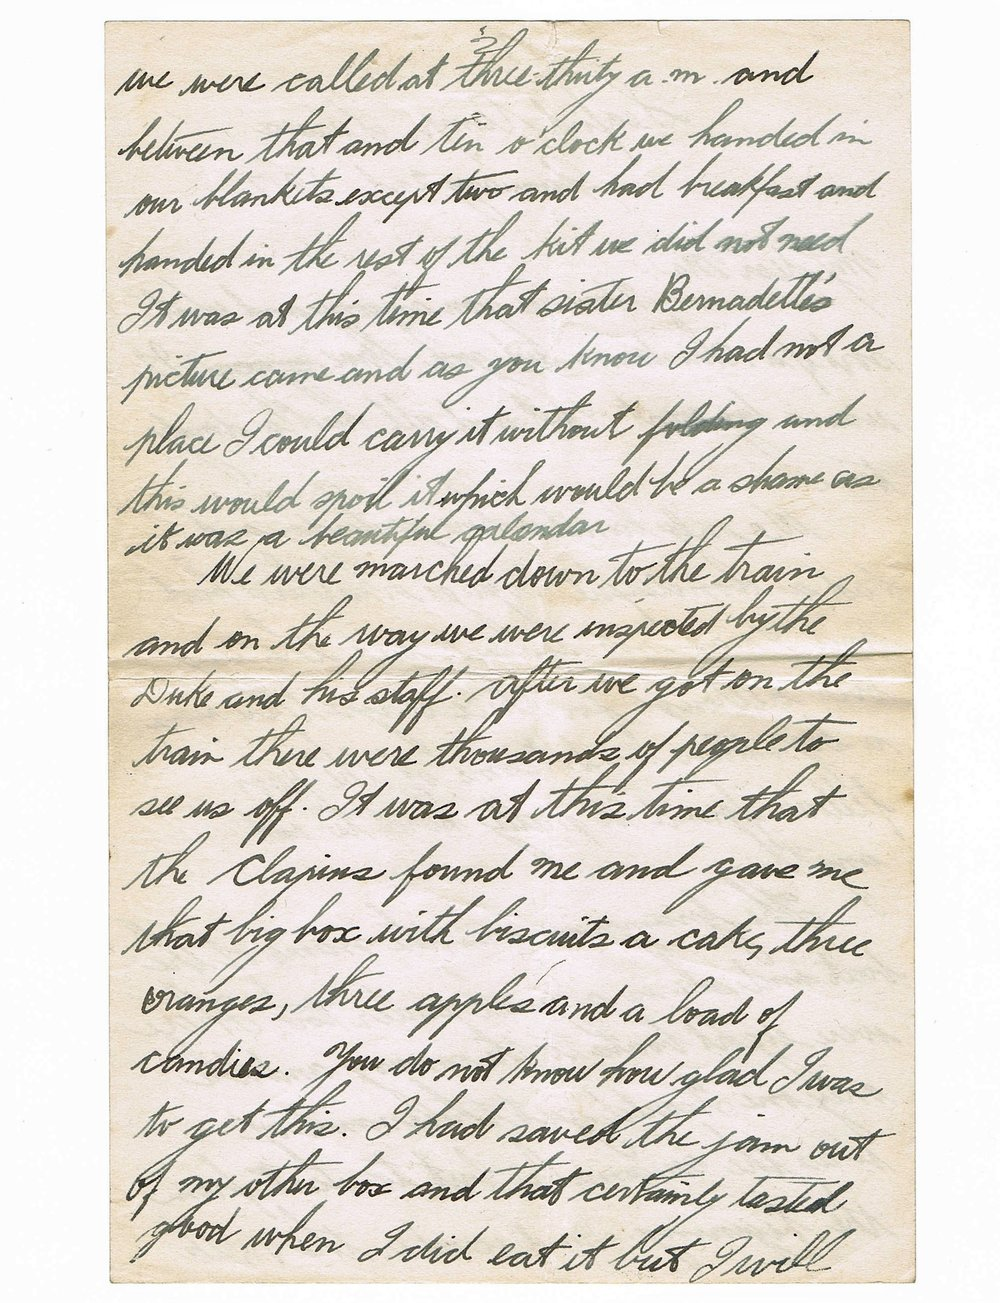 Basil Vale January 2, 1918 letter - page 2.jpg